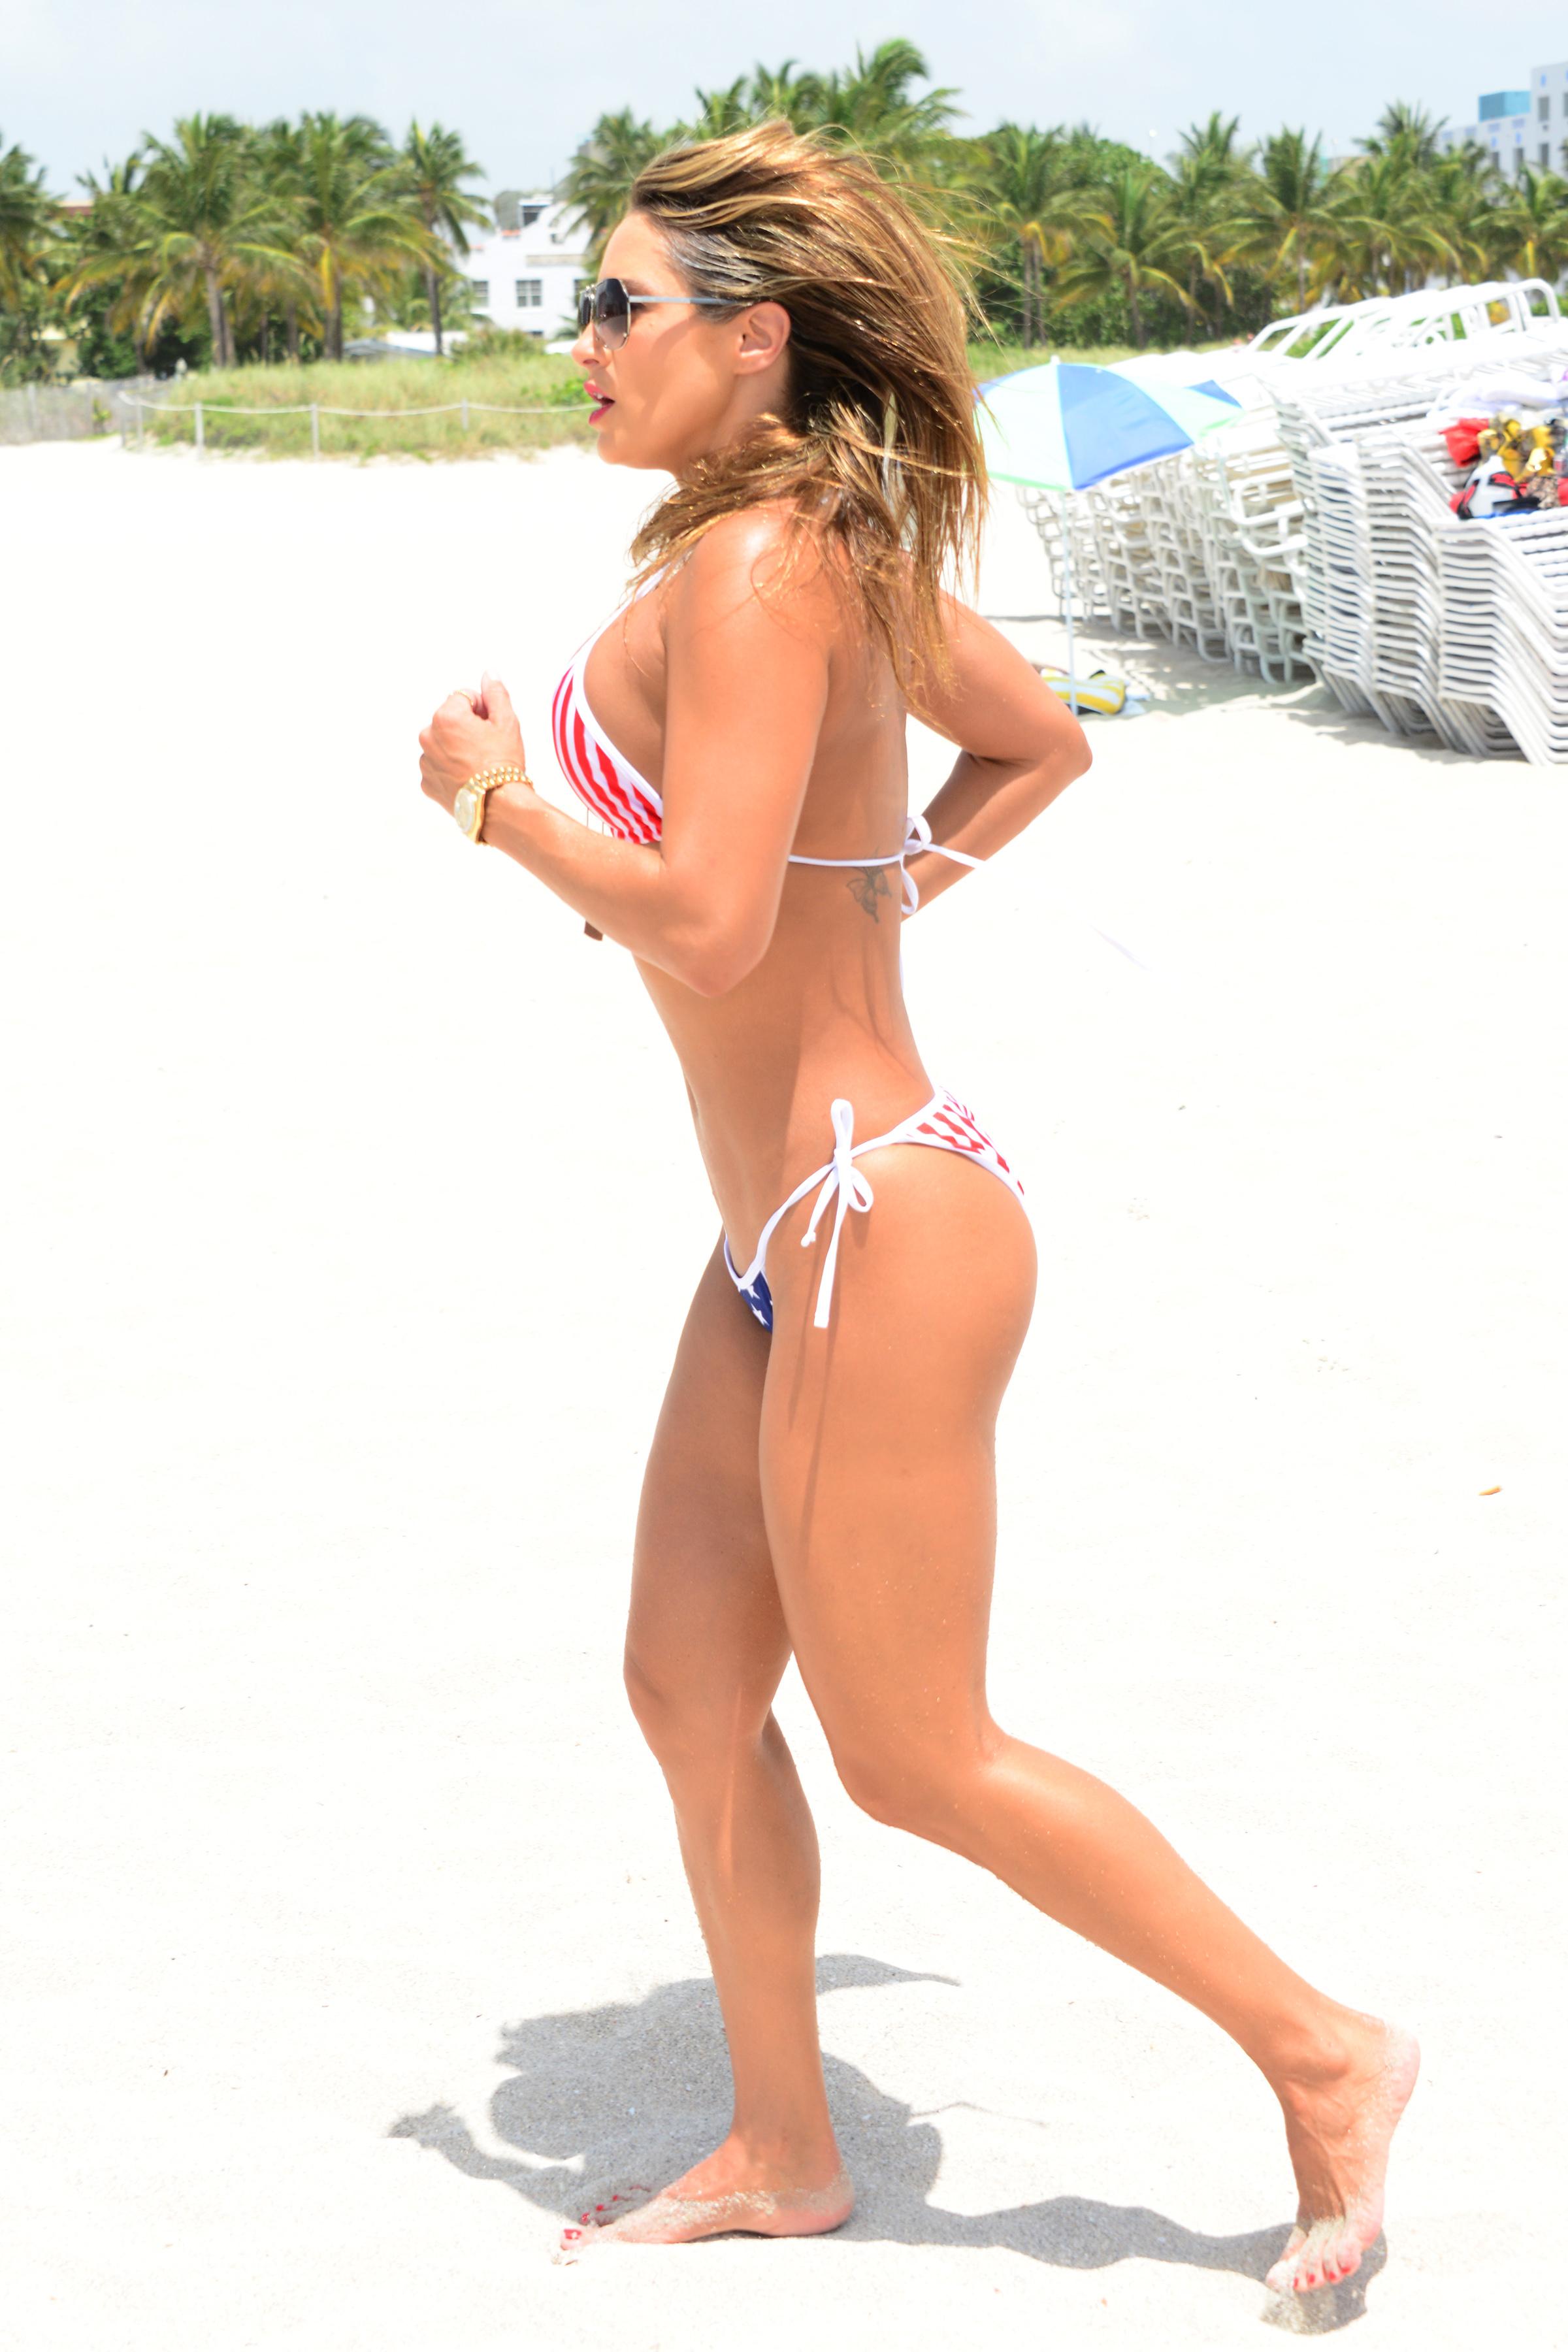 Jennifer-Nicole-Lee_bangtidy-net_1346884.jpg